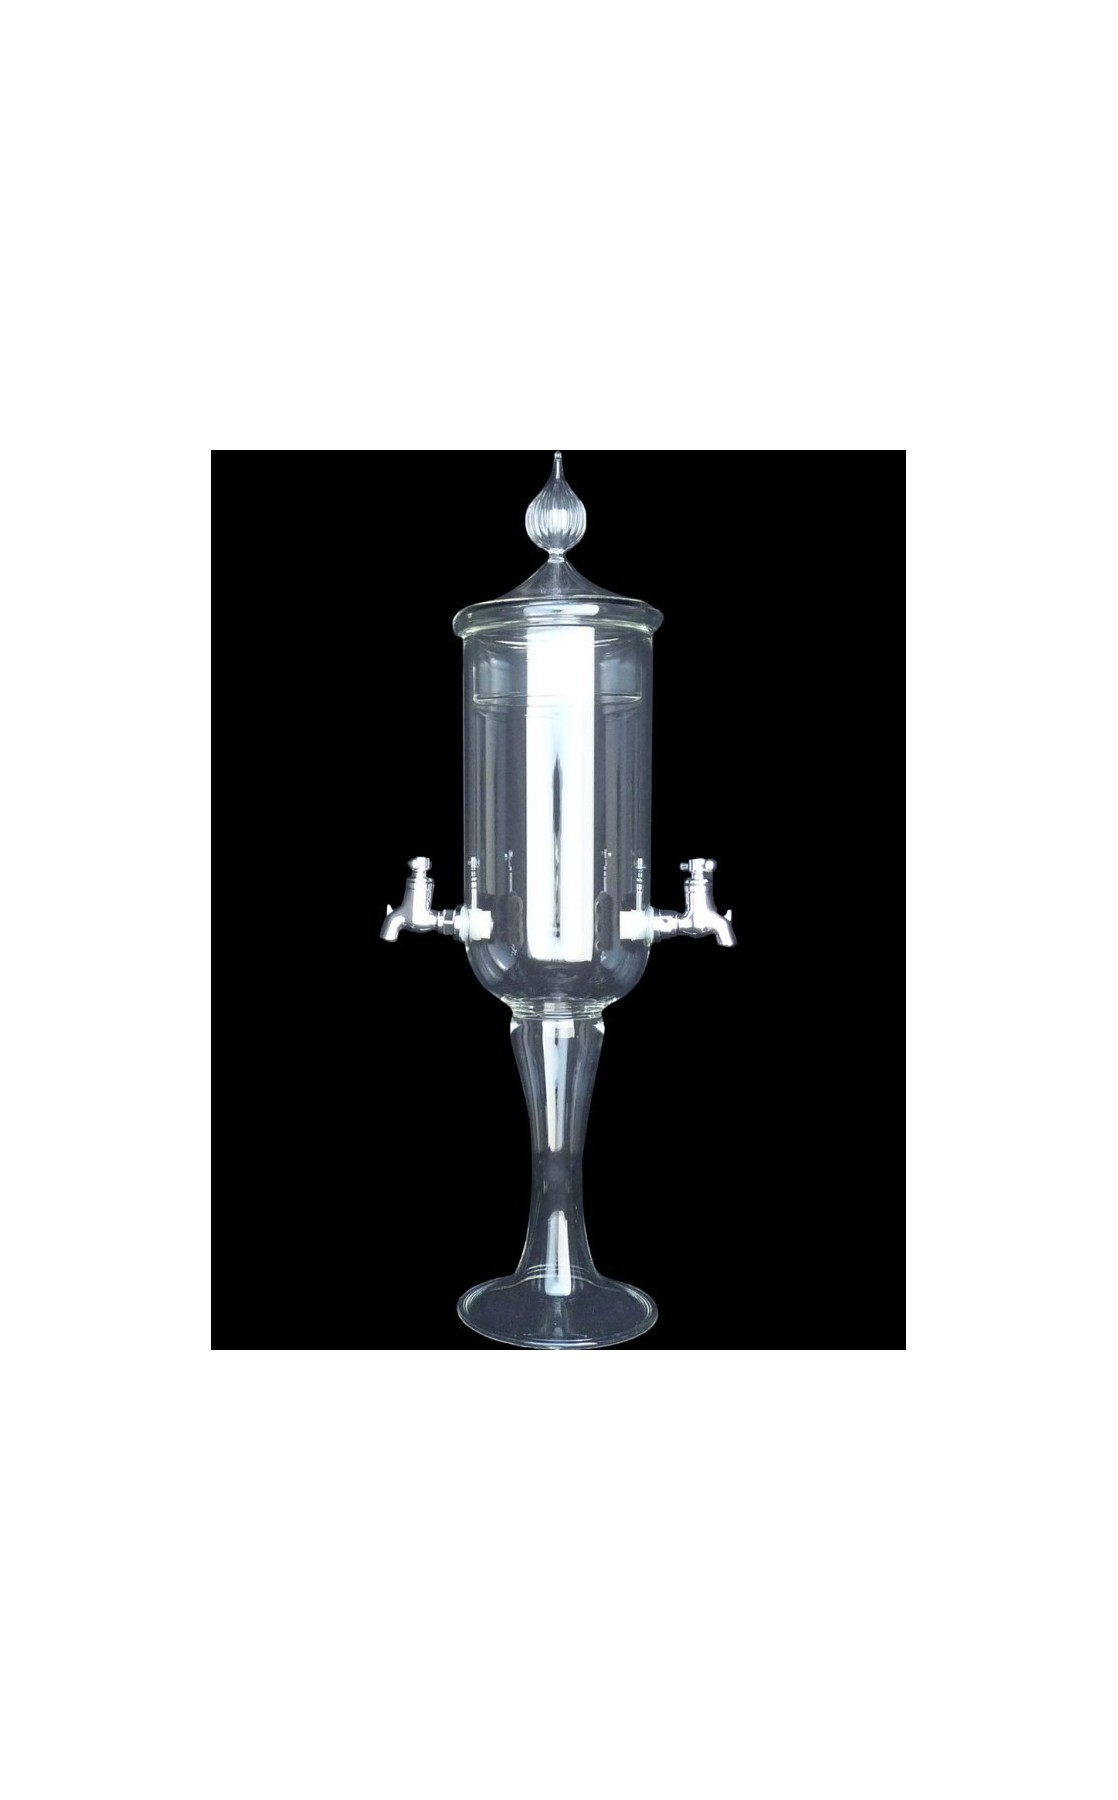 Petite fontaine à absinthe 2 robinets Libertine